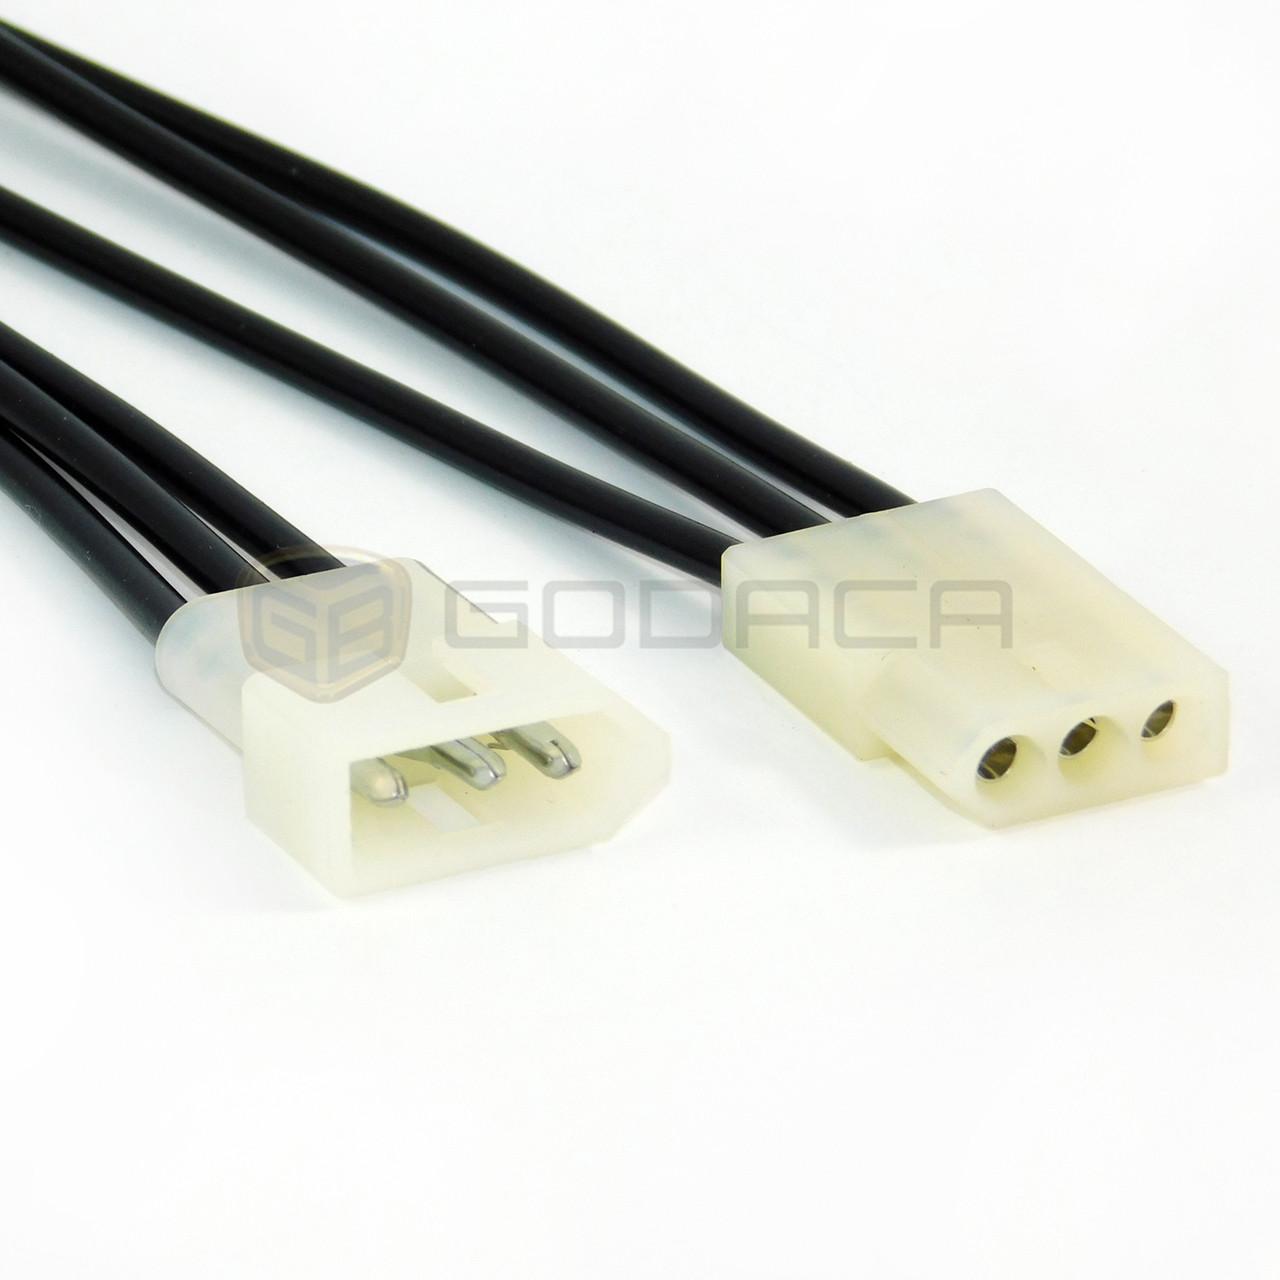 medium resolution of 1x connector female and male 3 way molex for motorcycle wiring loom godaca llc